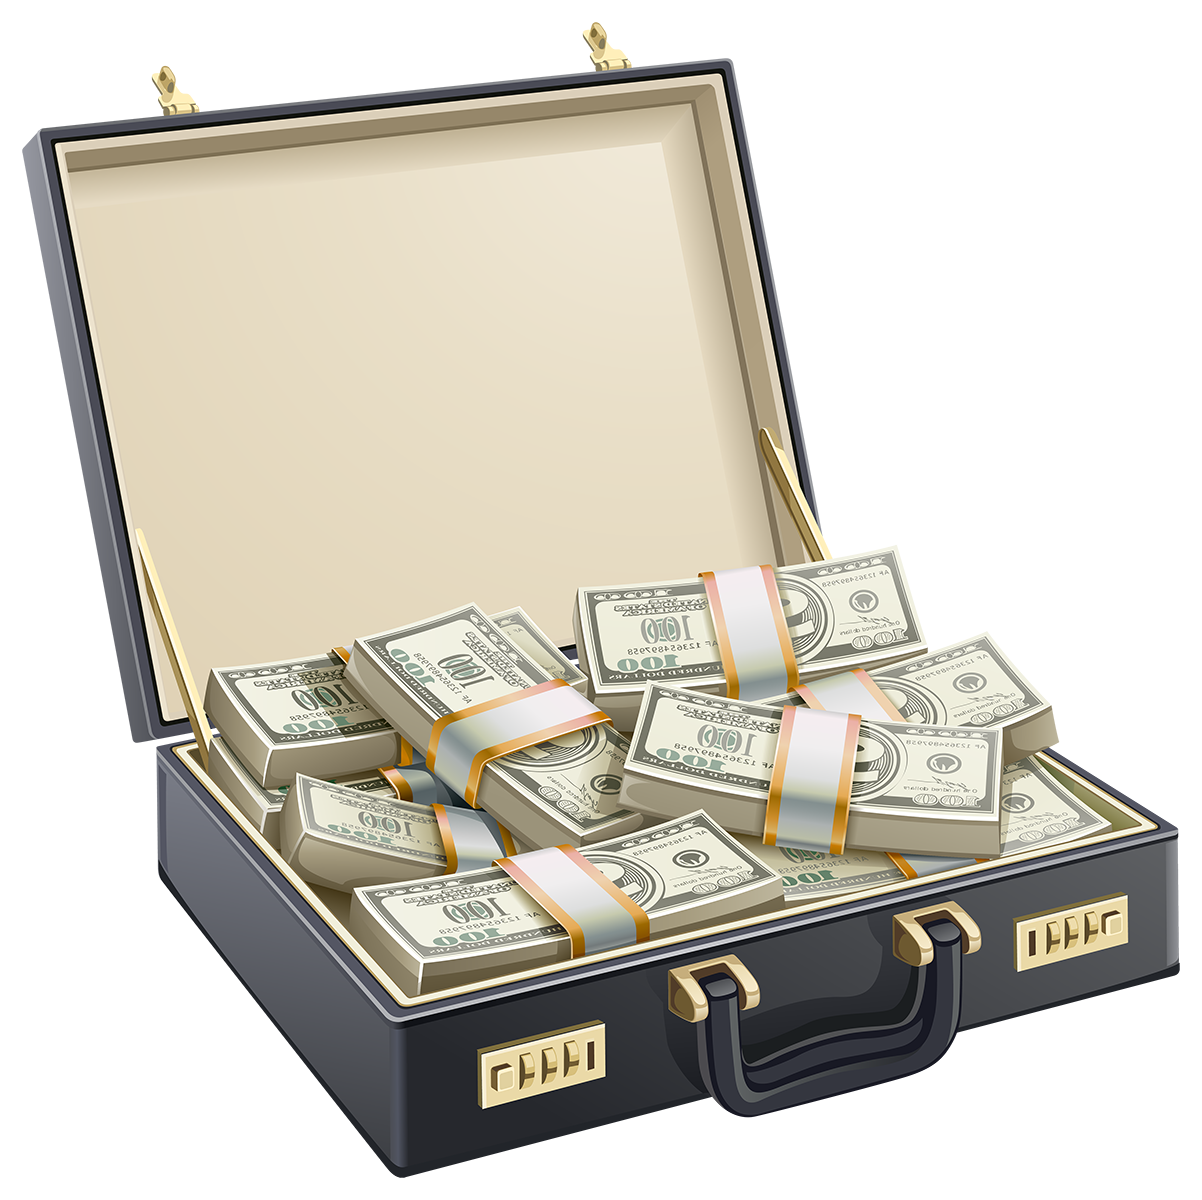 Чемодан с деньгами - чемодан, купюры, деньги, бизнес